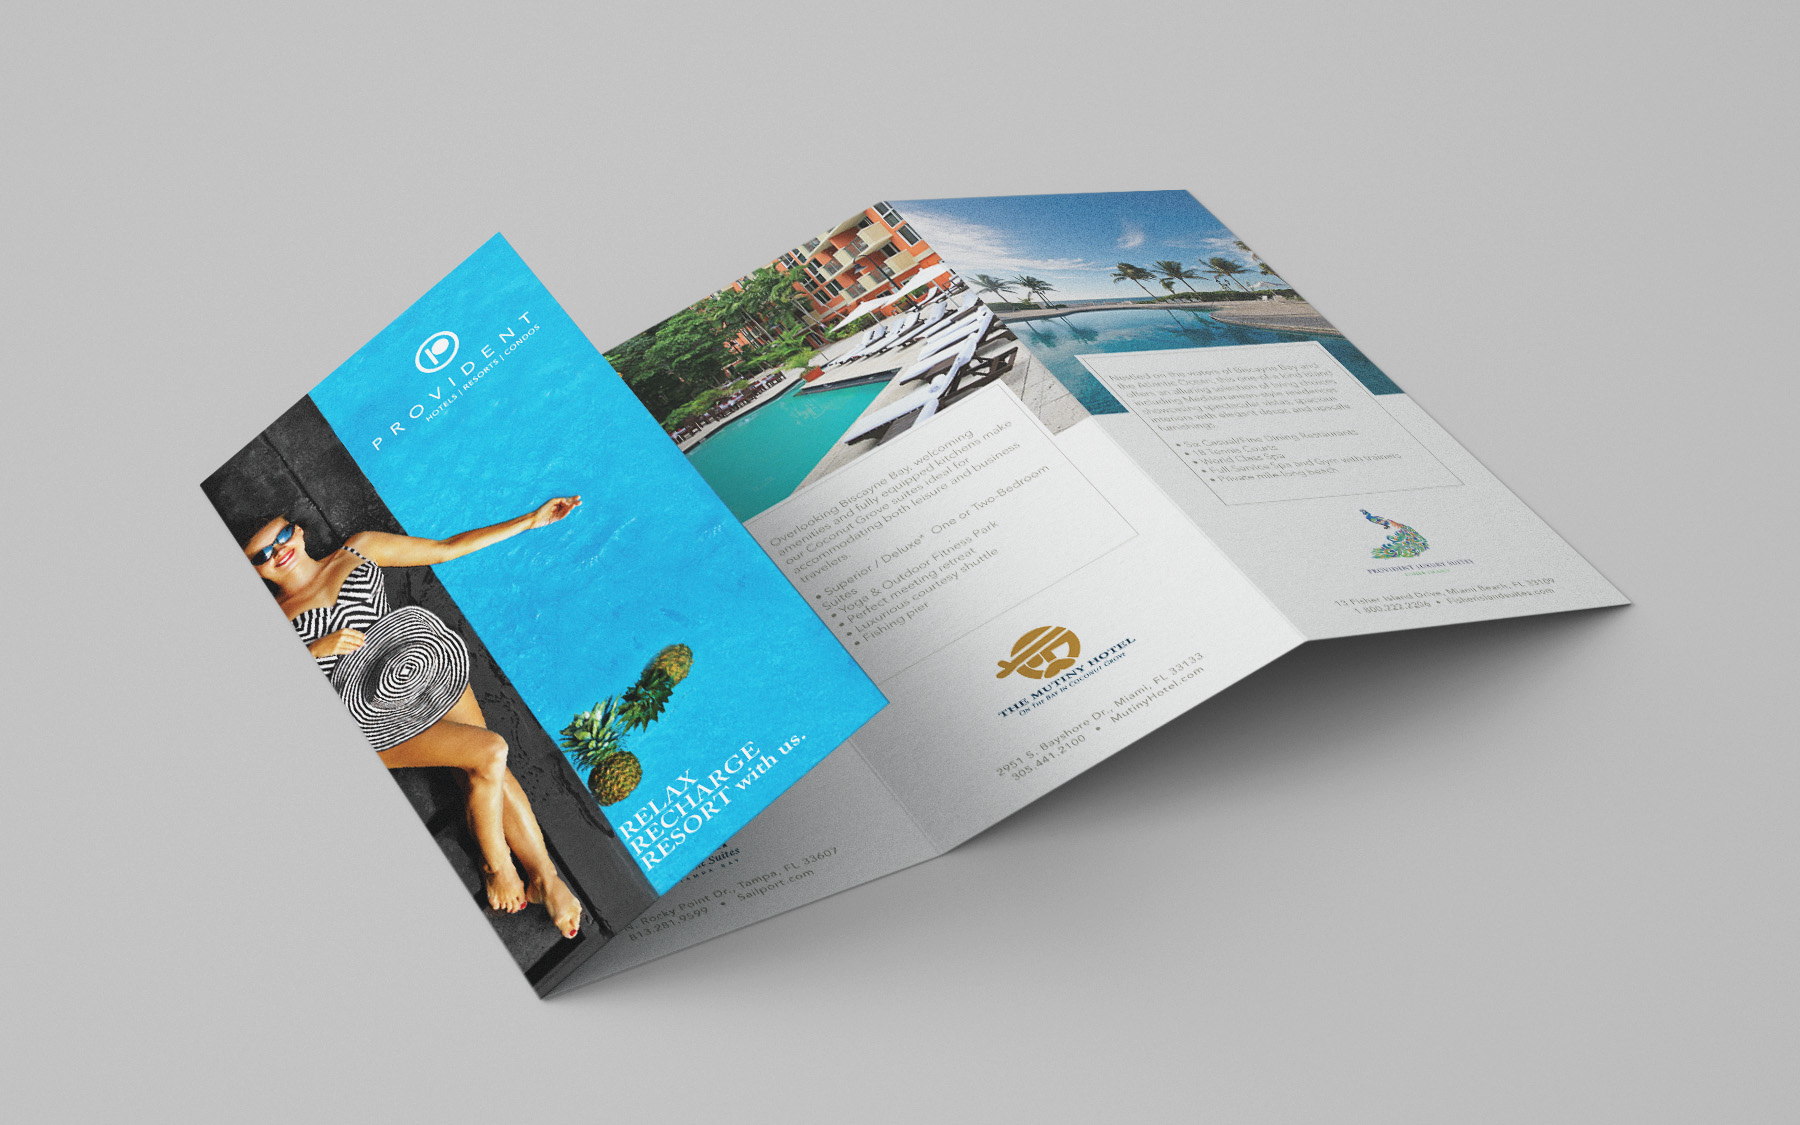 Provident 4 Fold Brochure for Trade